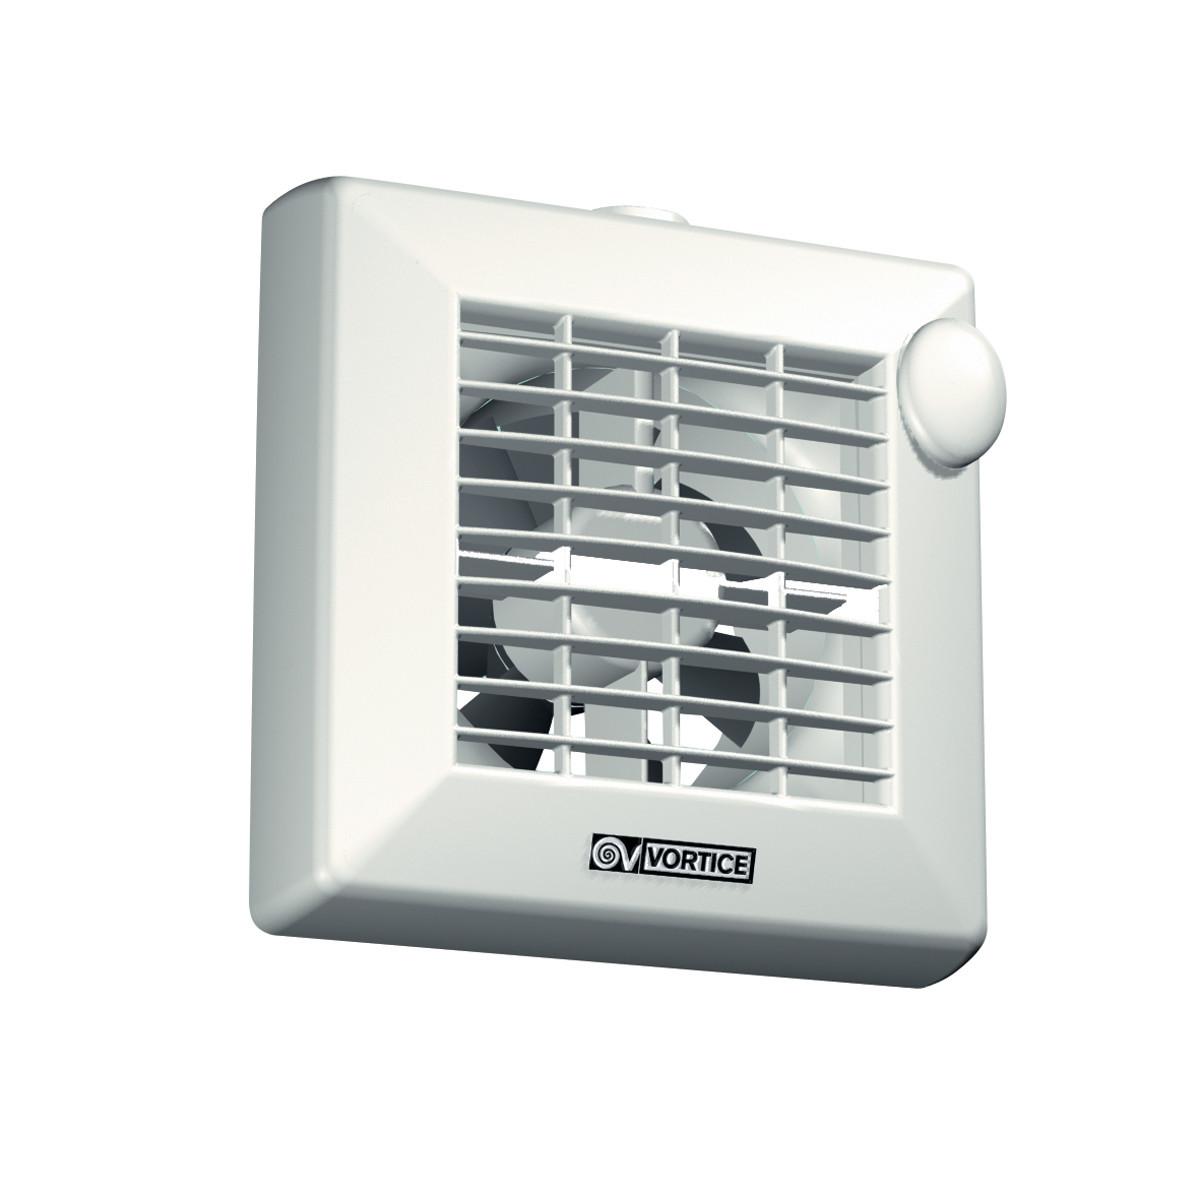 Vortice aspiratore incasso automatico timer m120 5 at - Aspiratore vortice per cucina ...